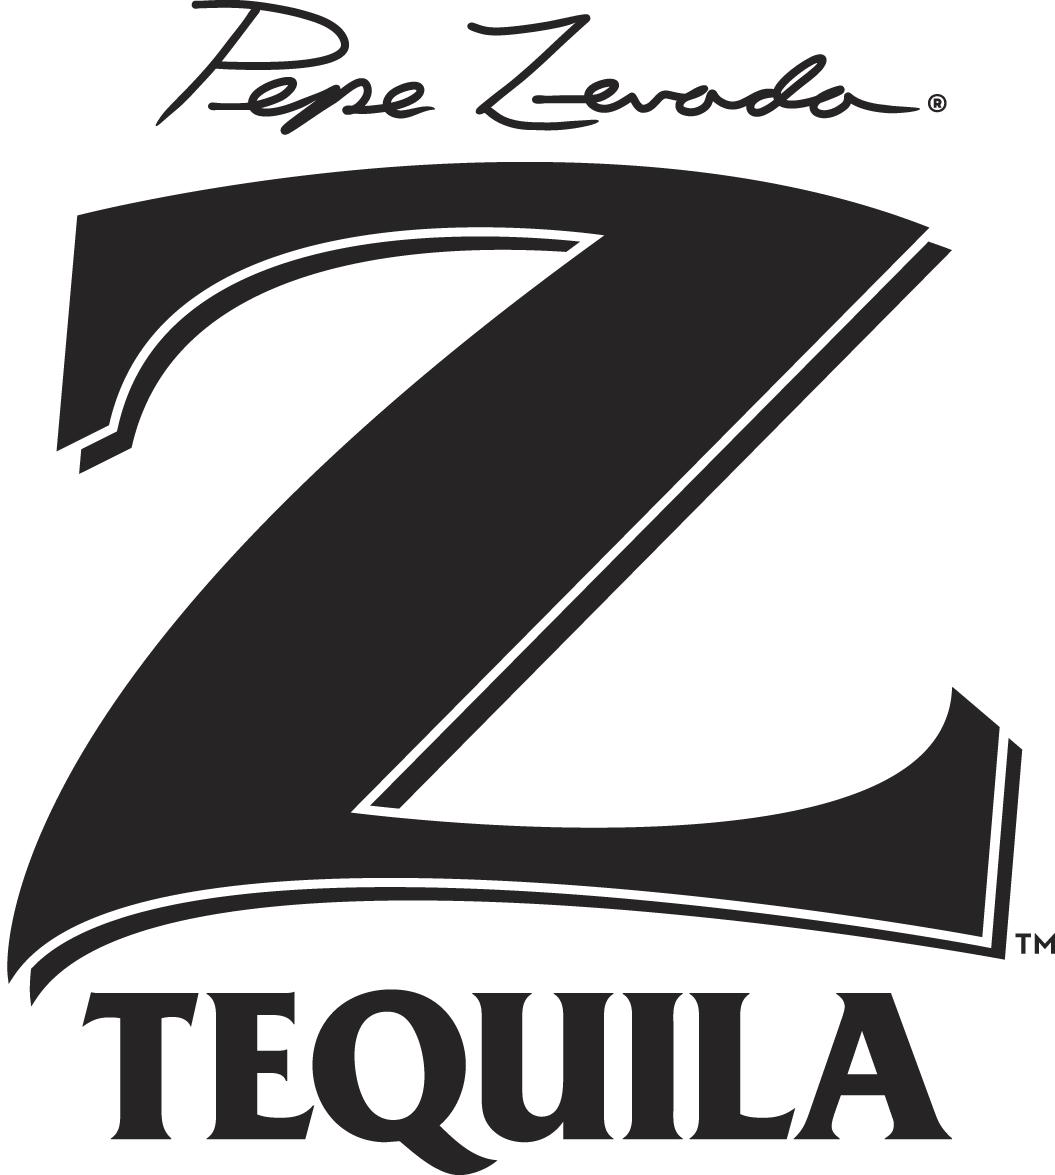 Z_Tequila_logo_Black_042512.png